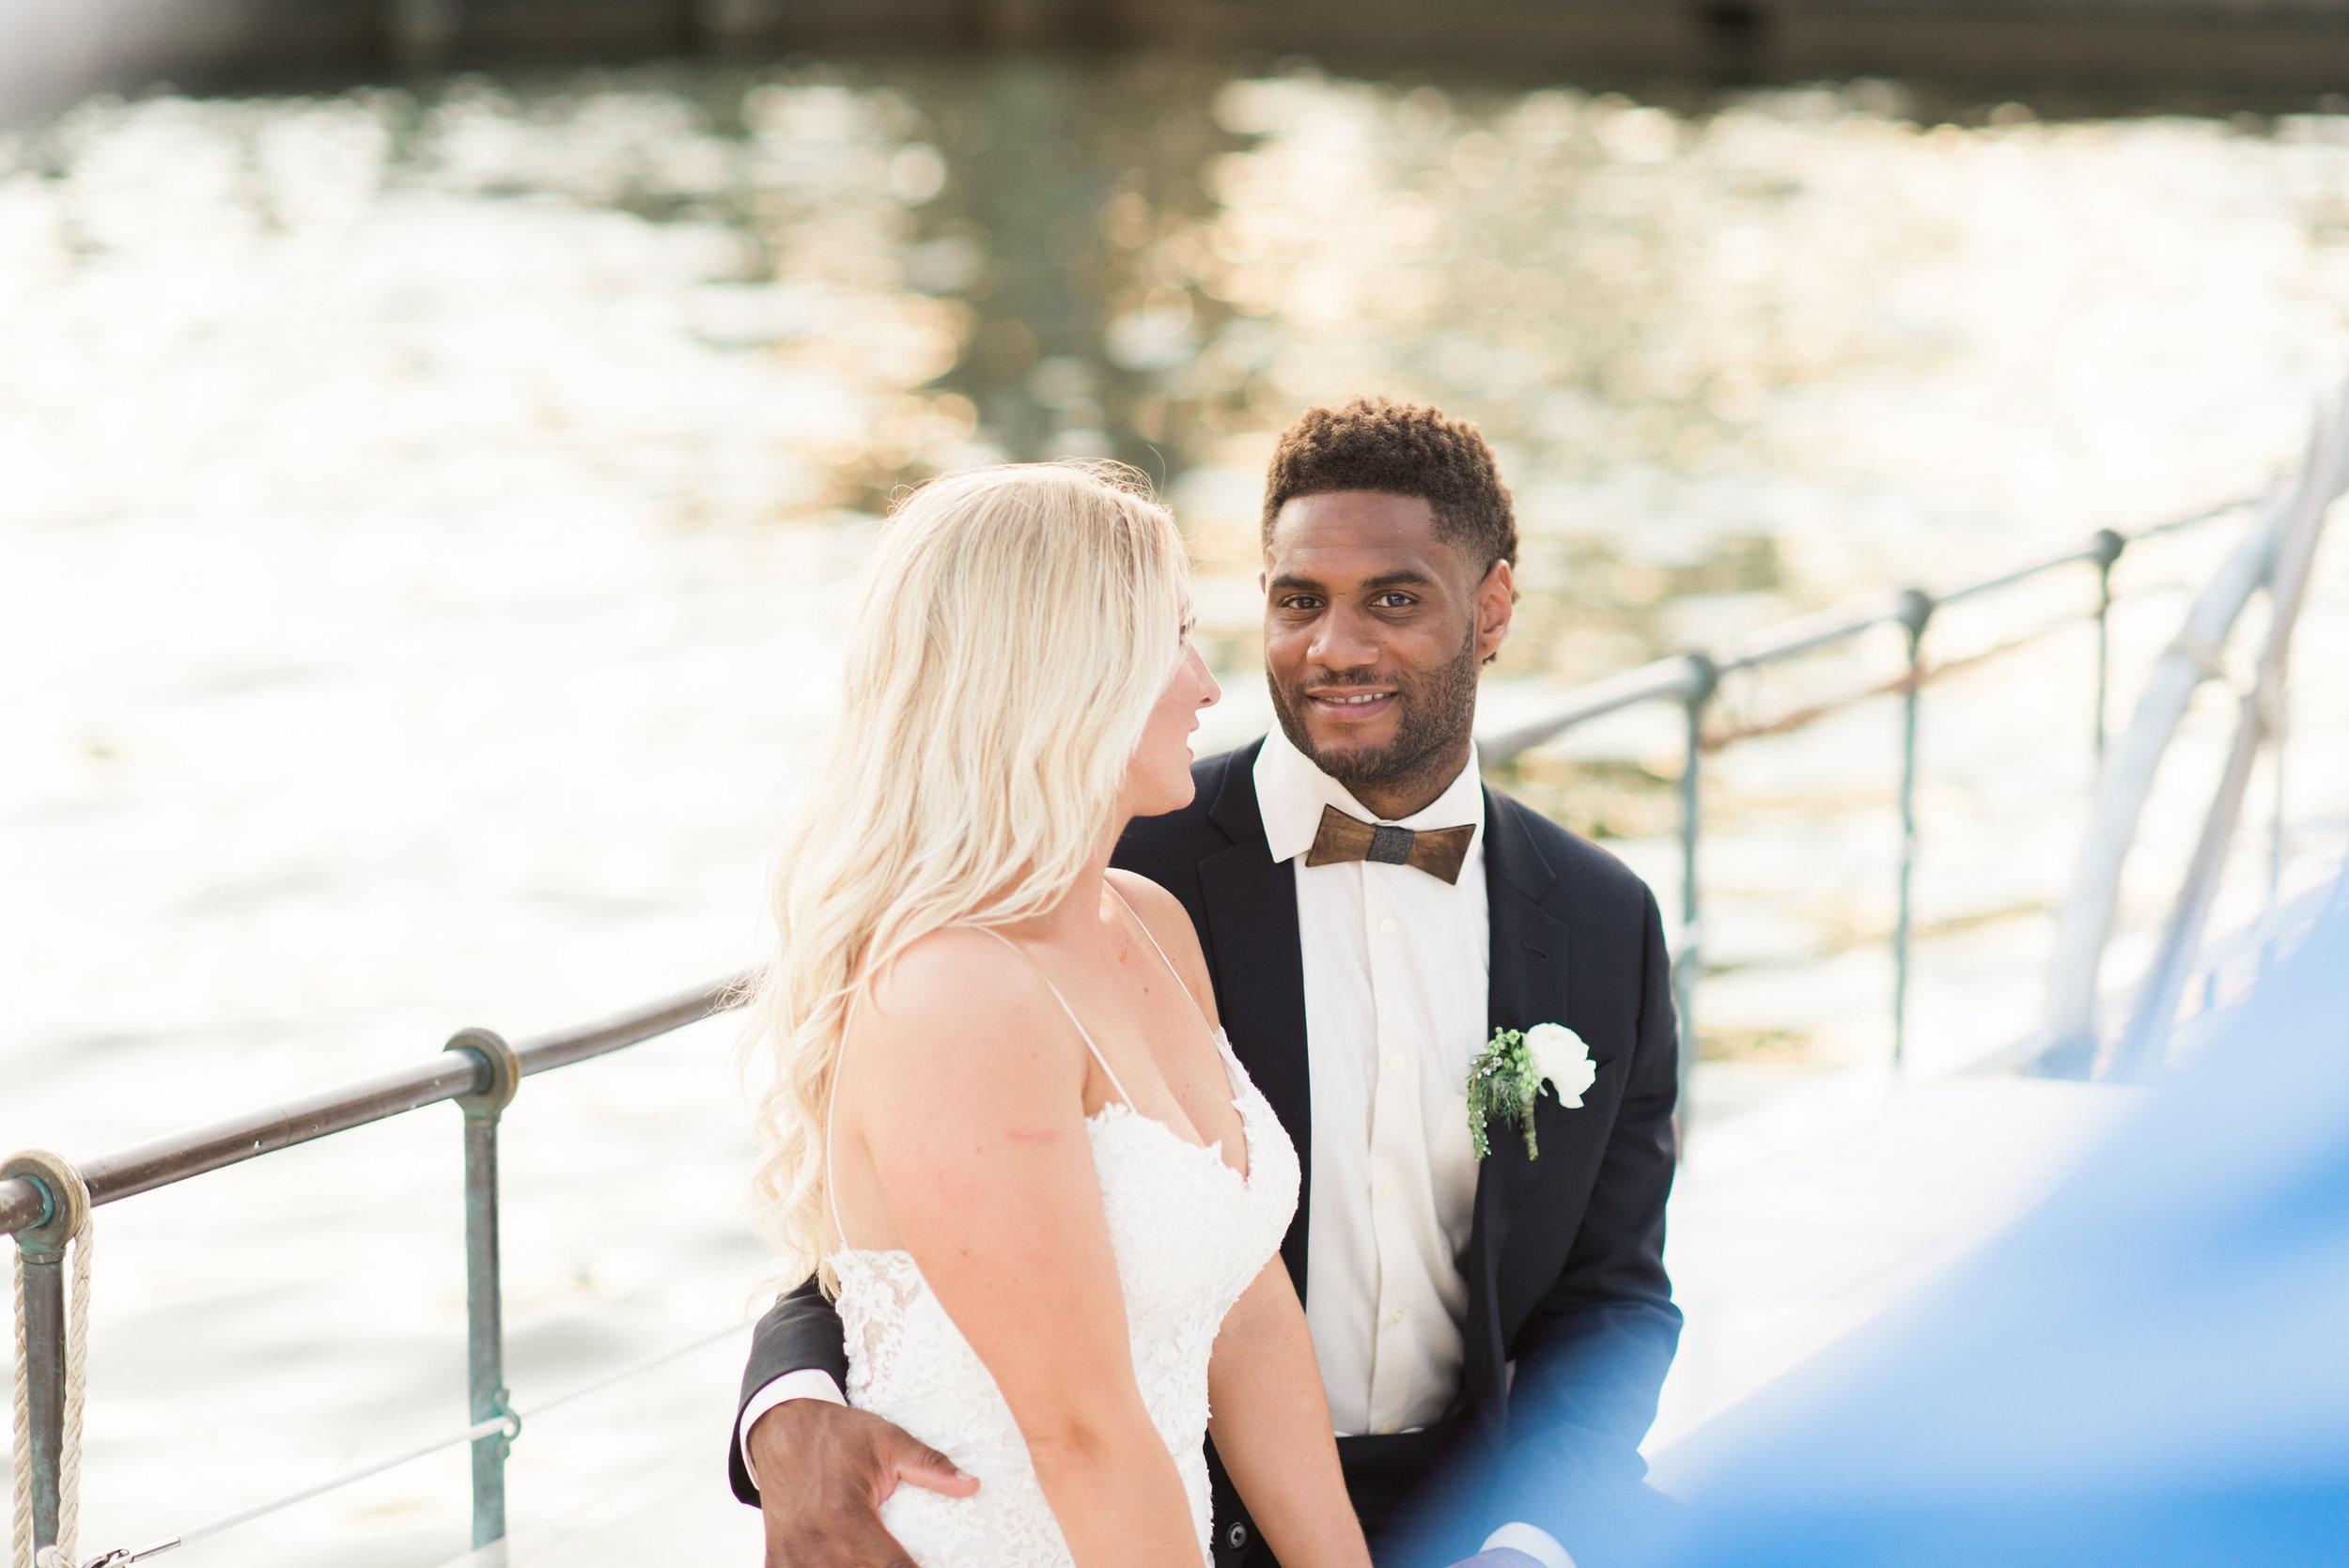 joy-michelle-photography-styled-wedding(186of204).jpg